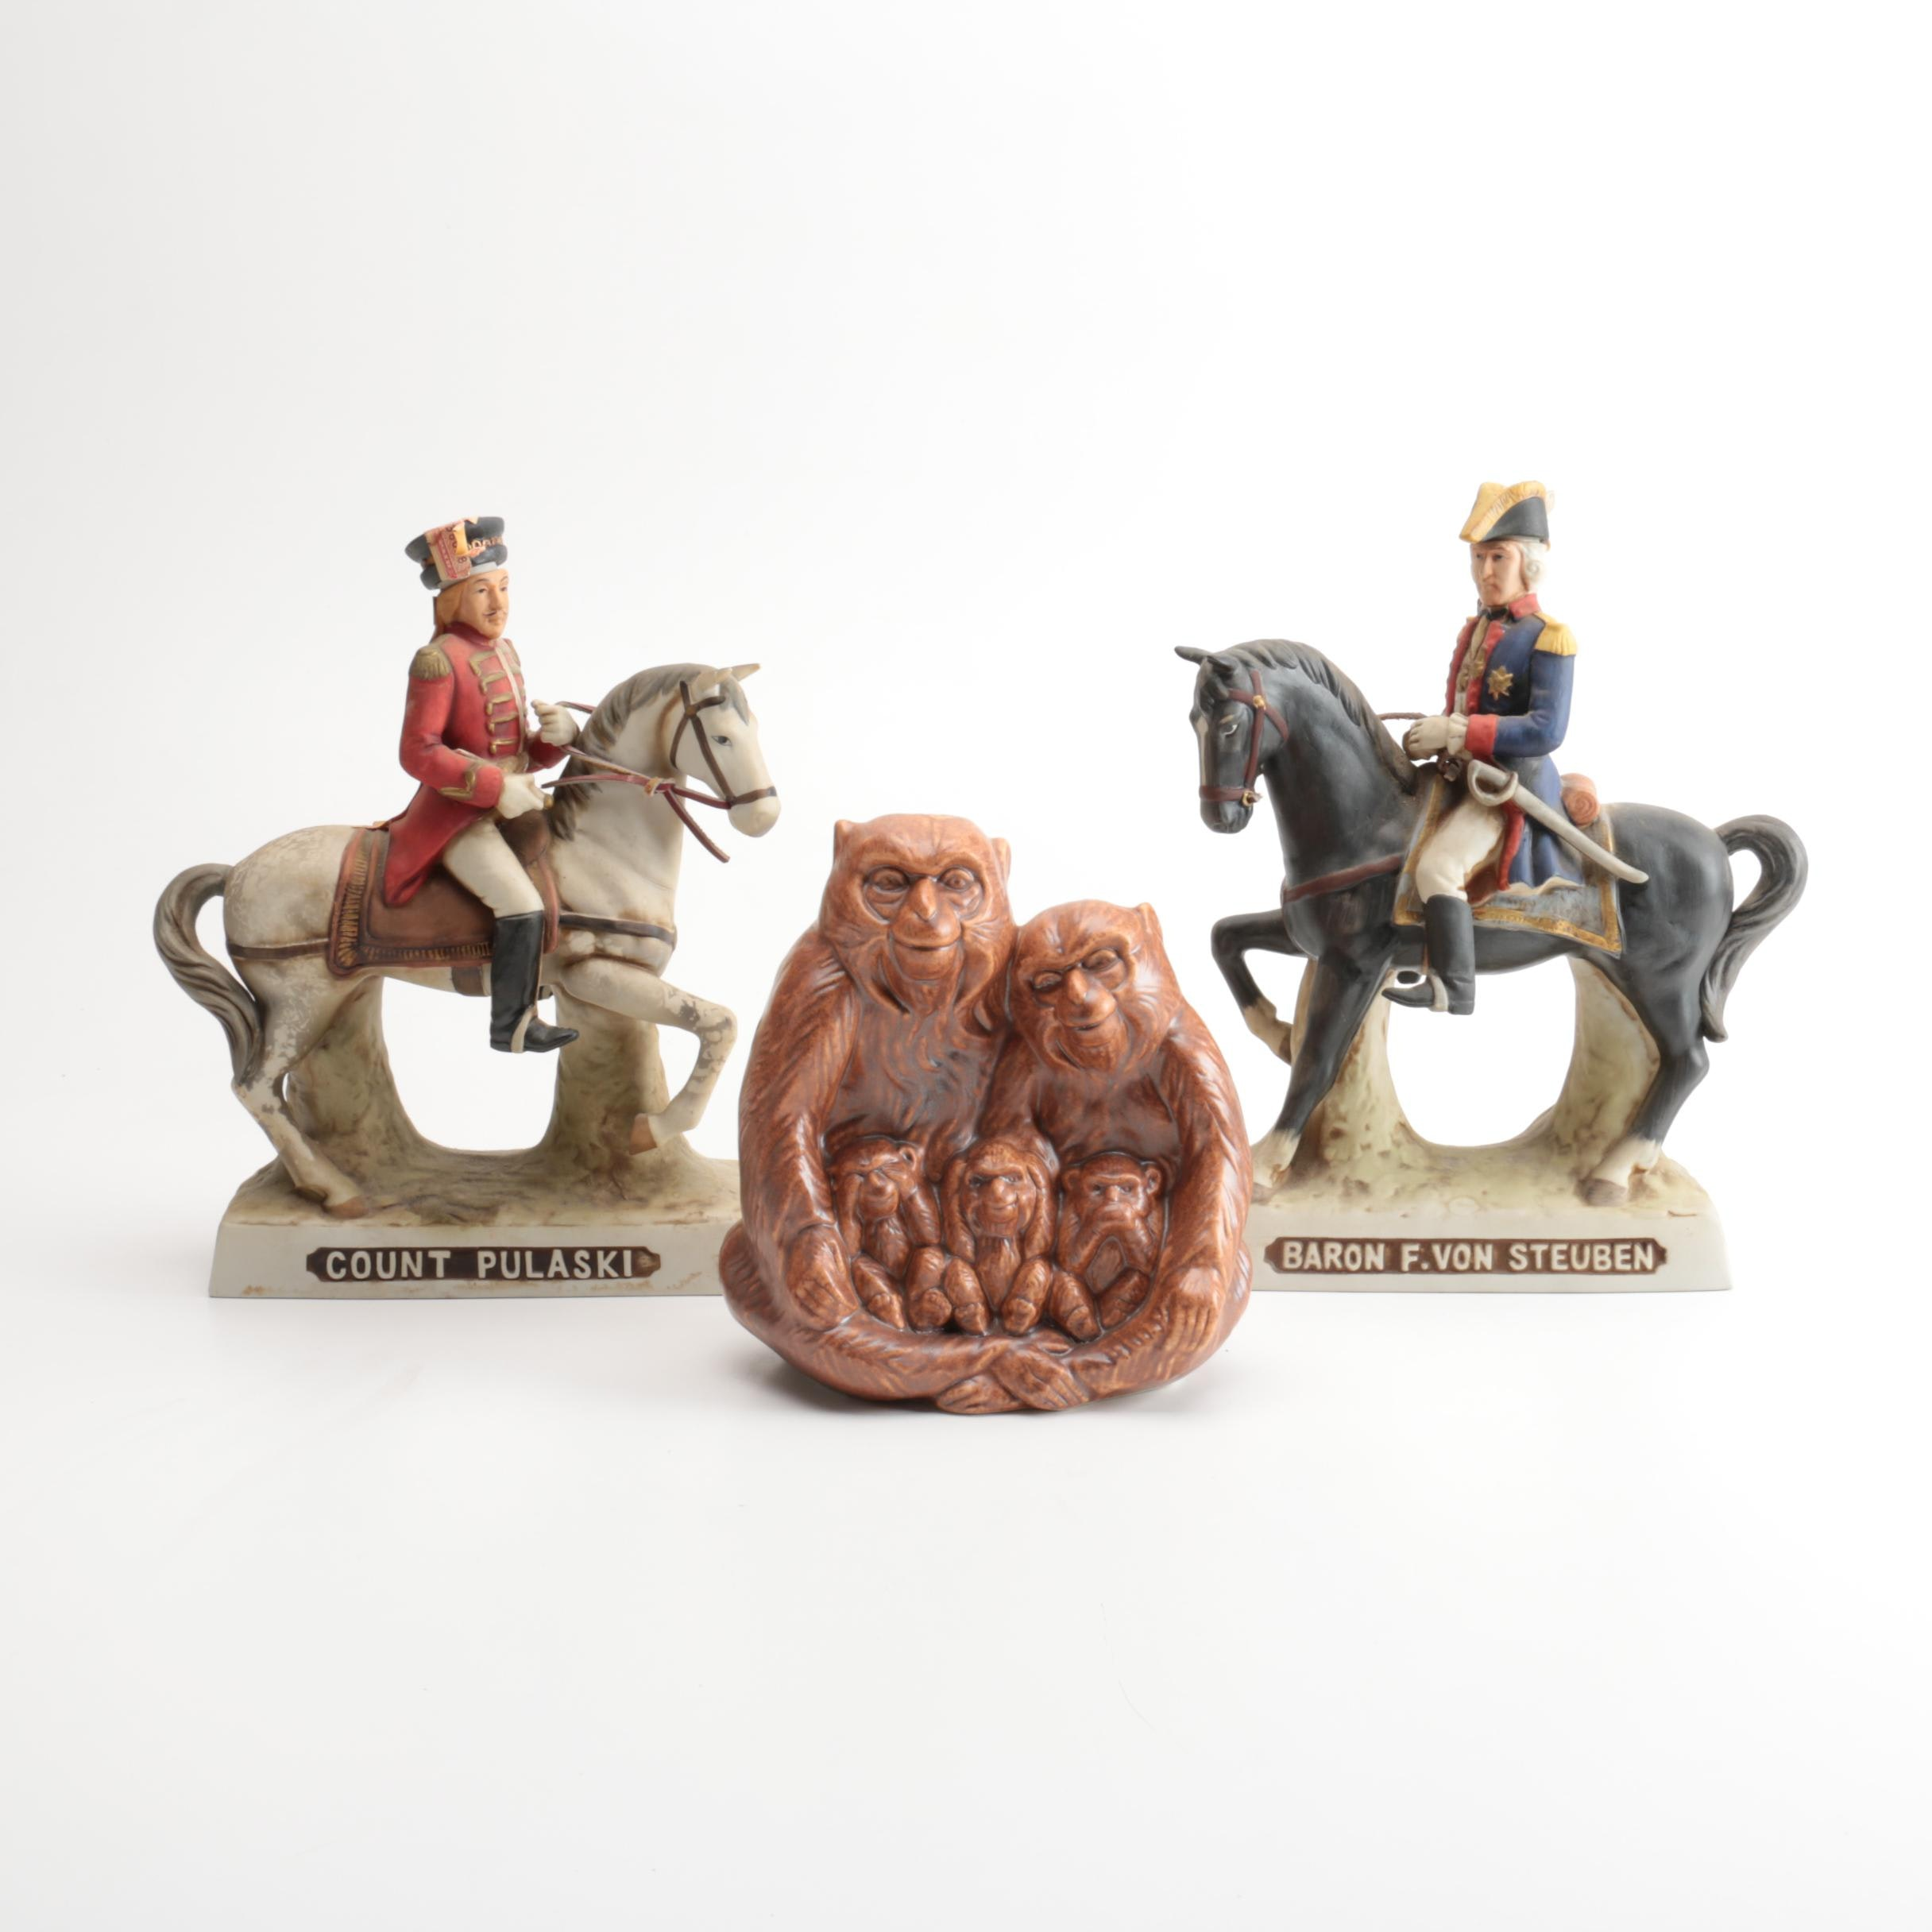 Decorative and Commemorative Decanters